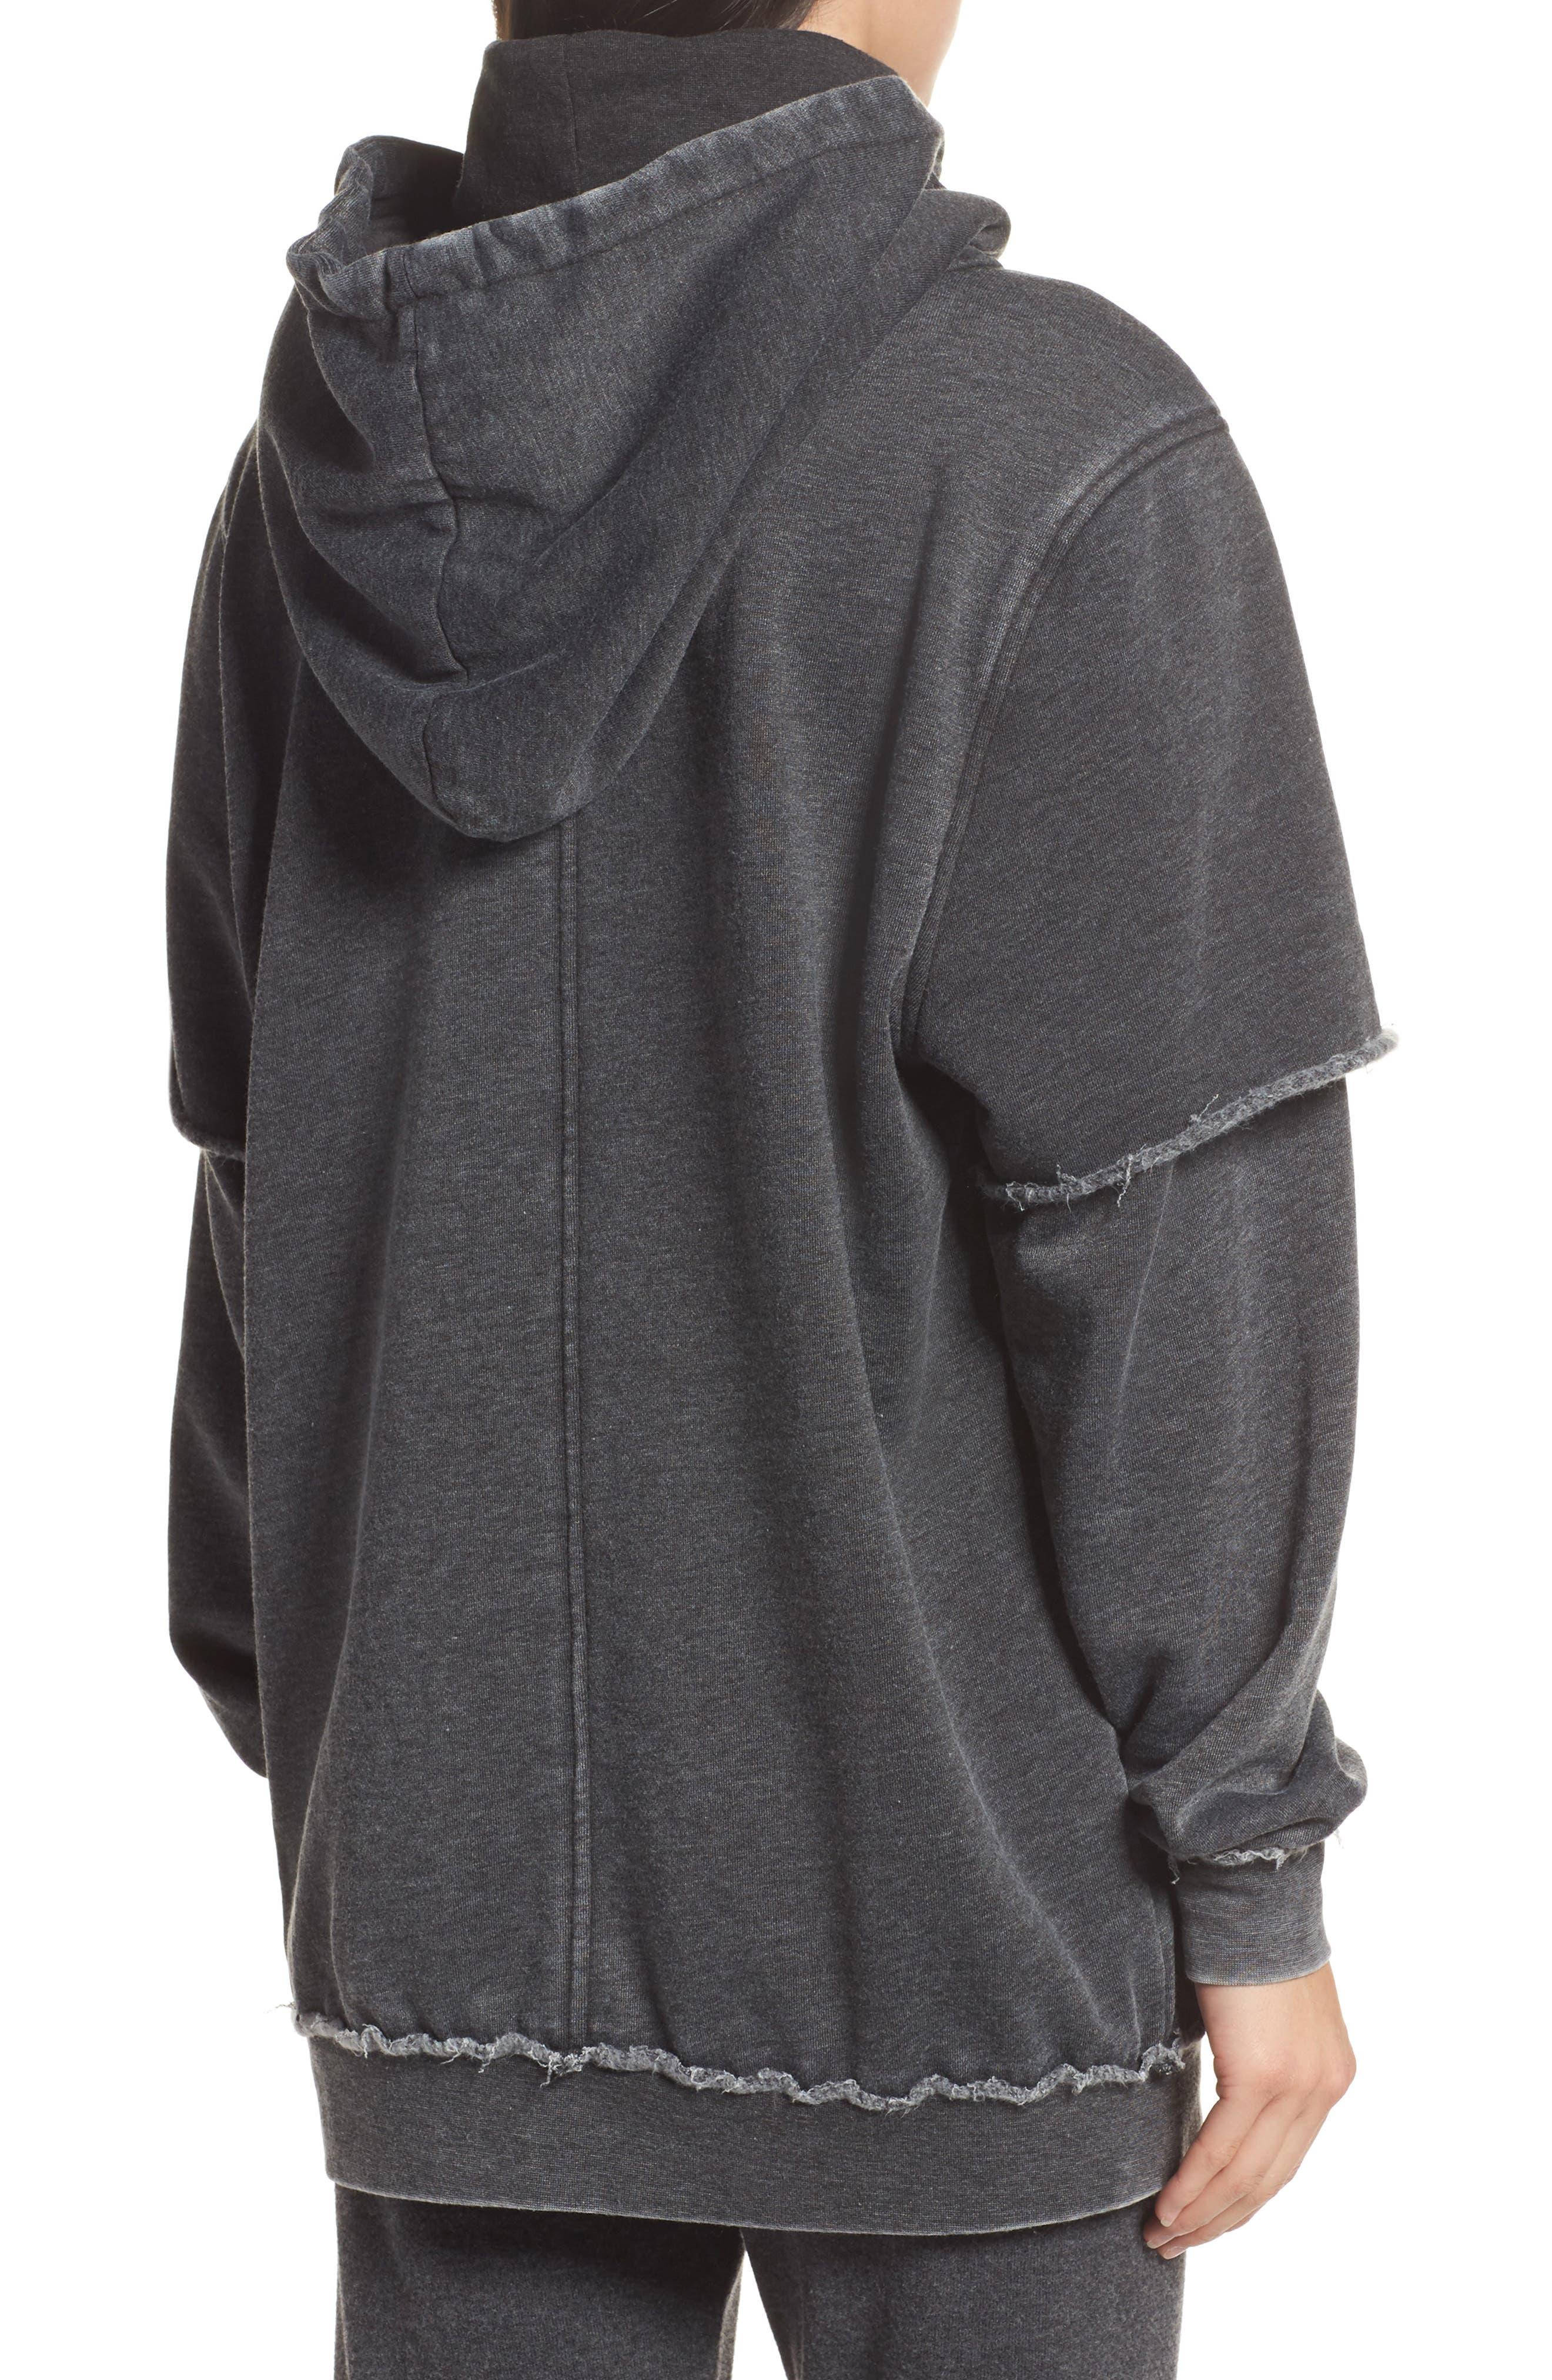 Good Hood Sweatshirt Dress,                             Alternate thumbnail 2, color,                             020